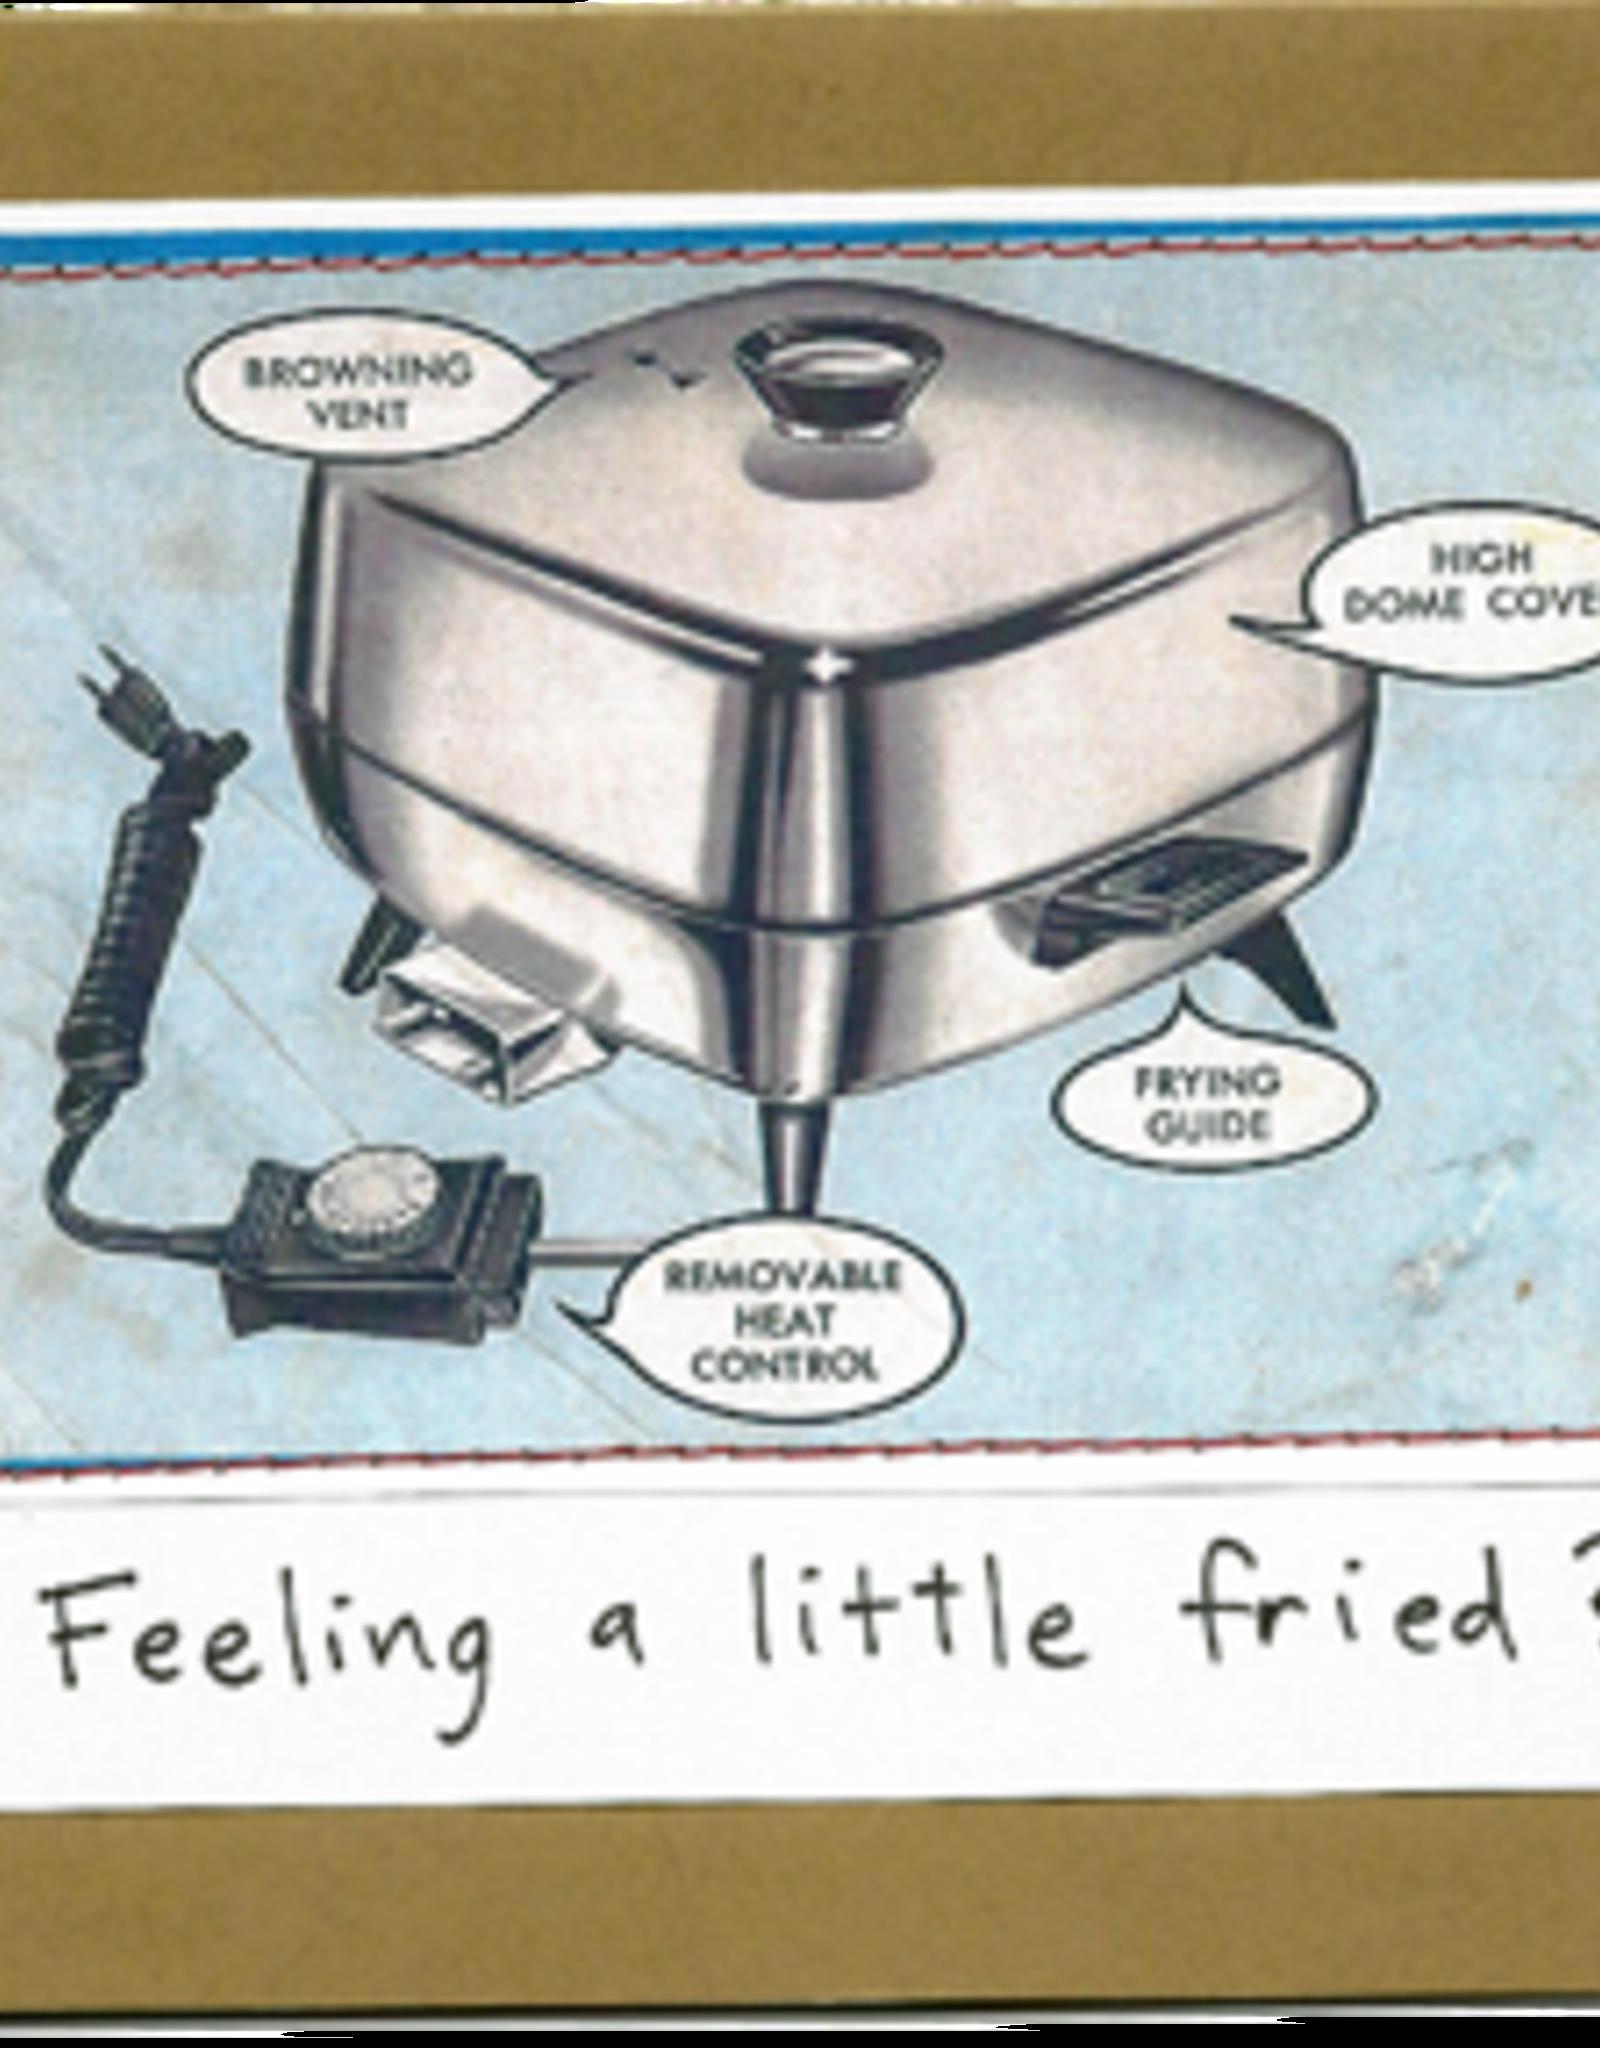 CARD-HUMOR, FEELING A BIT FRIED